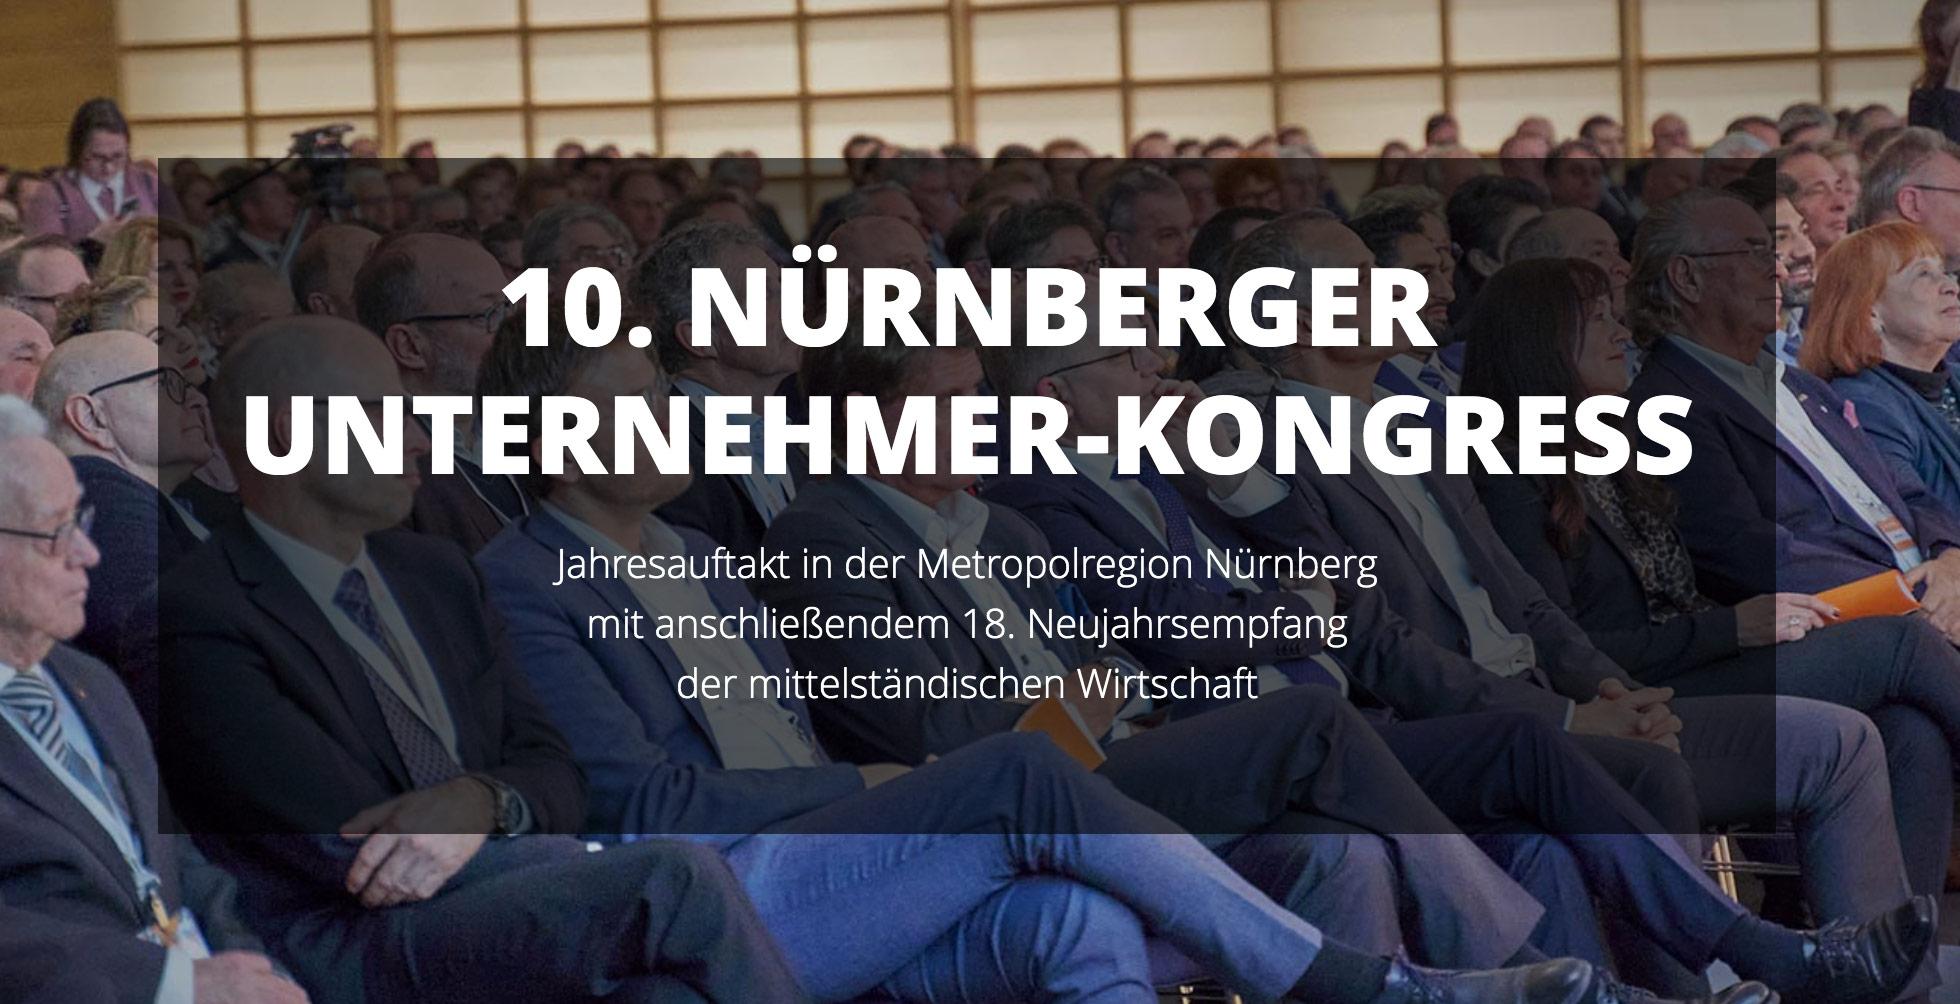 #MissionZukunft – 10. Nürnberger Unternehmer-Kongress